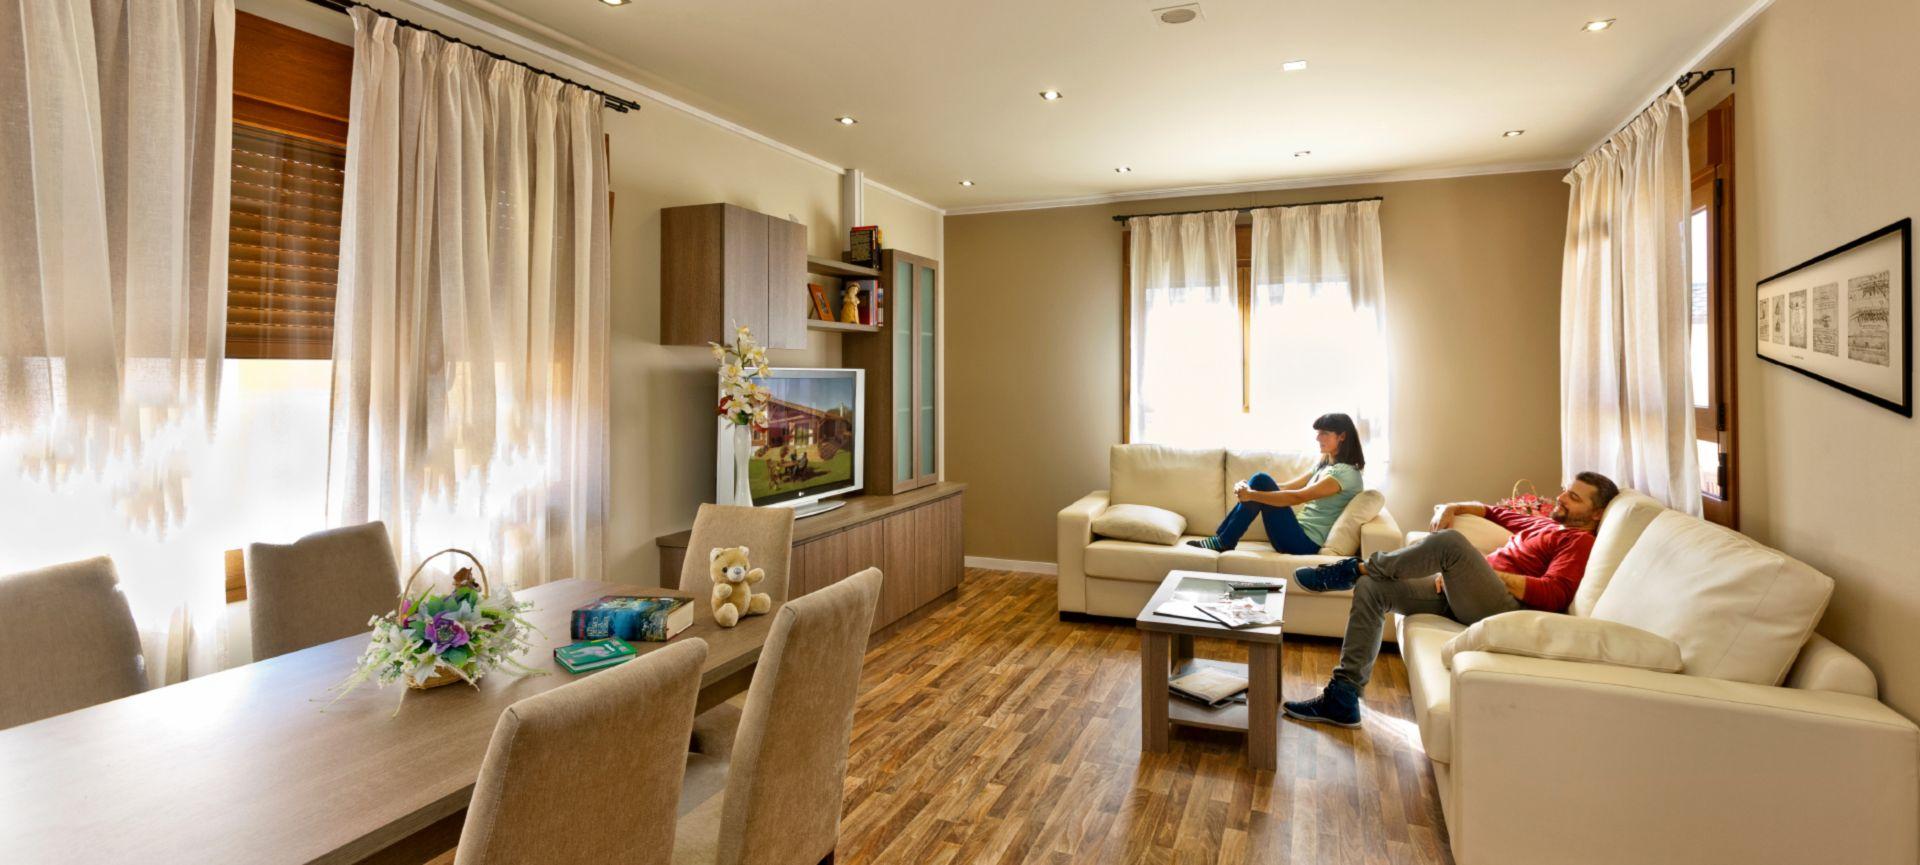 Casas prefabricadas modulares economicas y modernas eurocasa - Interiores de casas prefabricadas ...